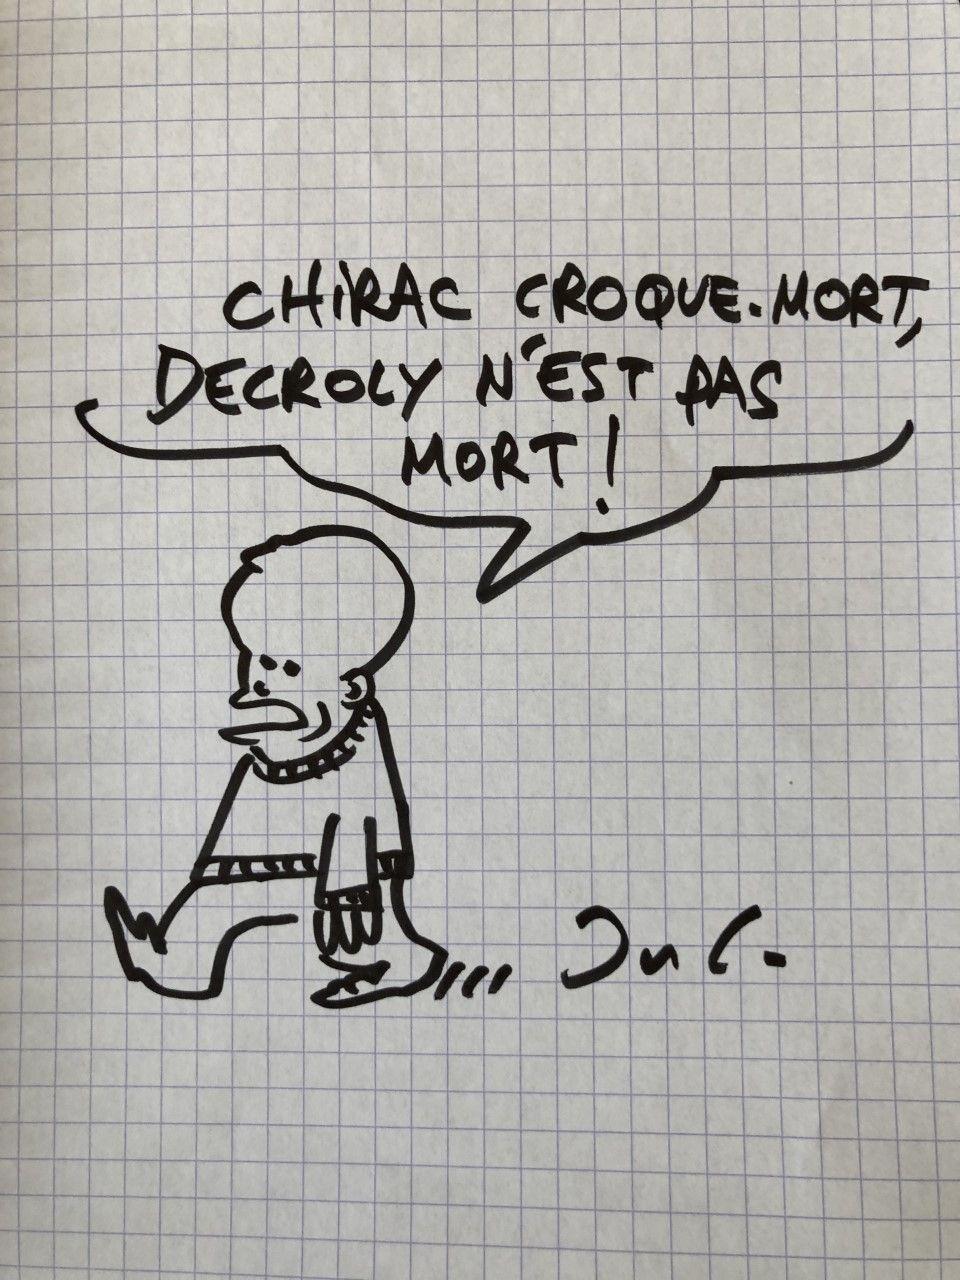 CHIRAC CROQUEMORT